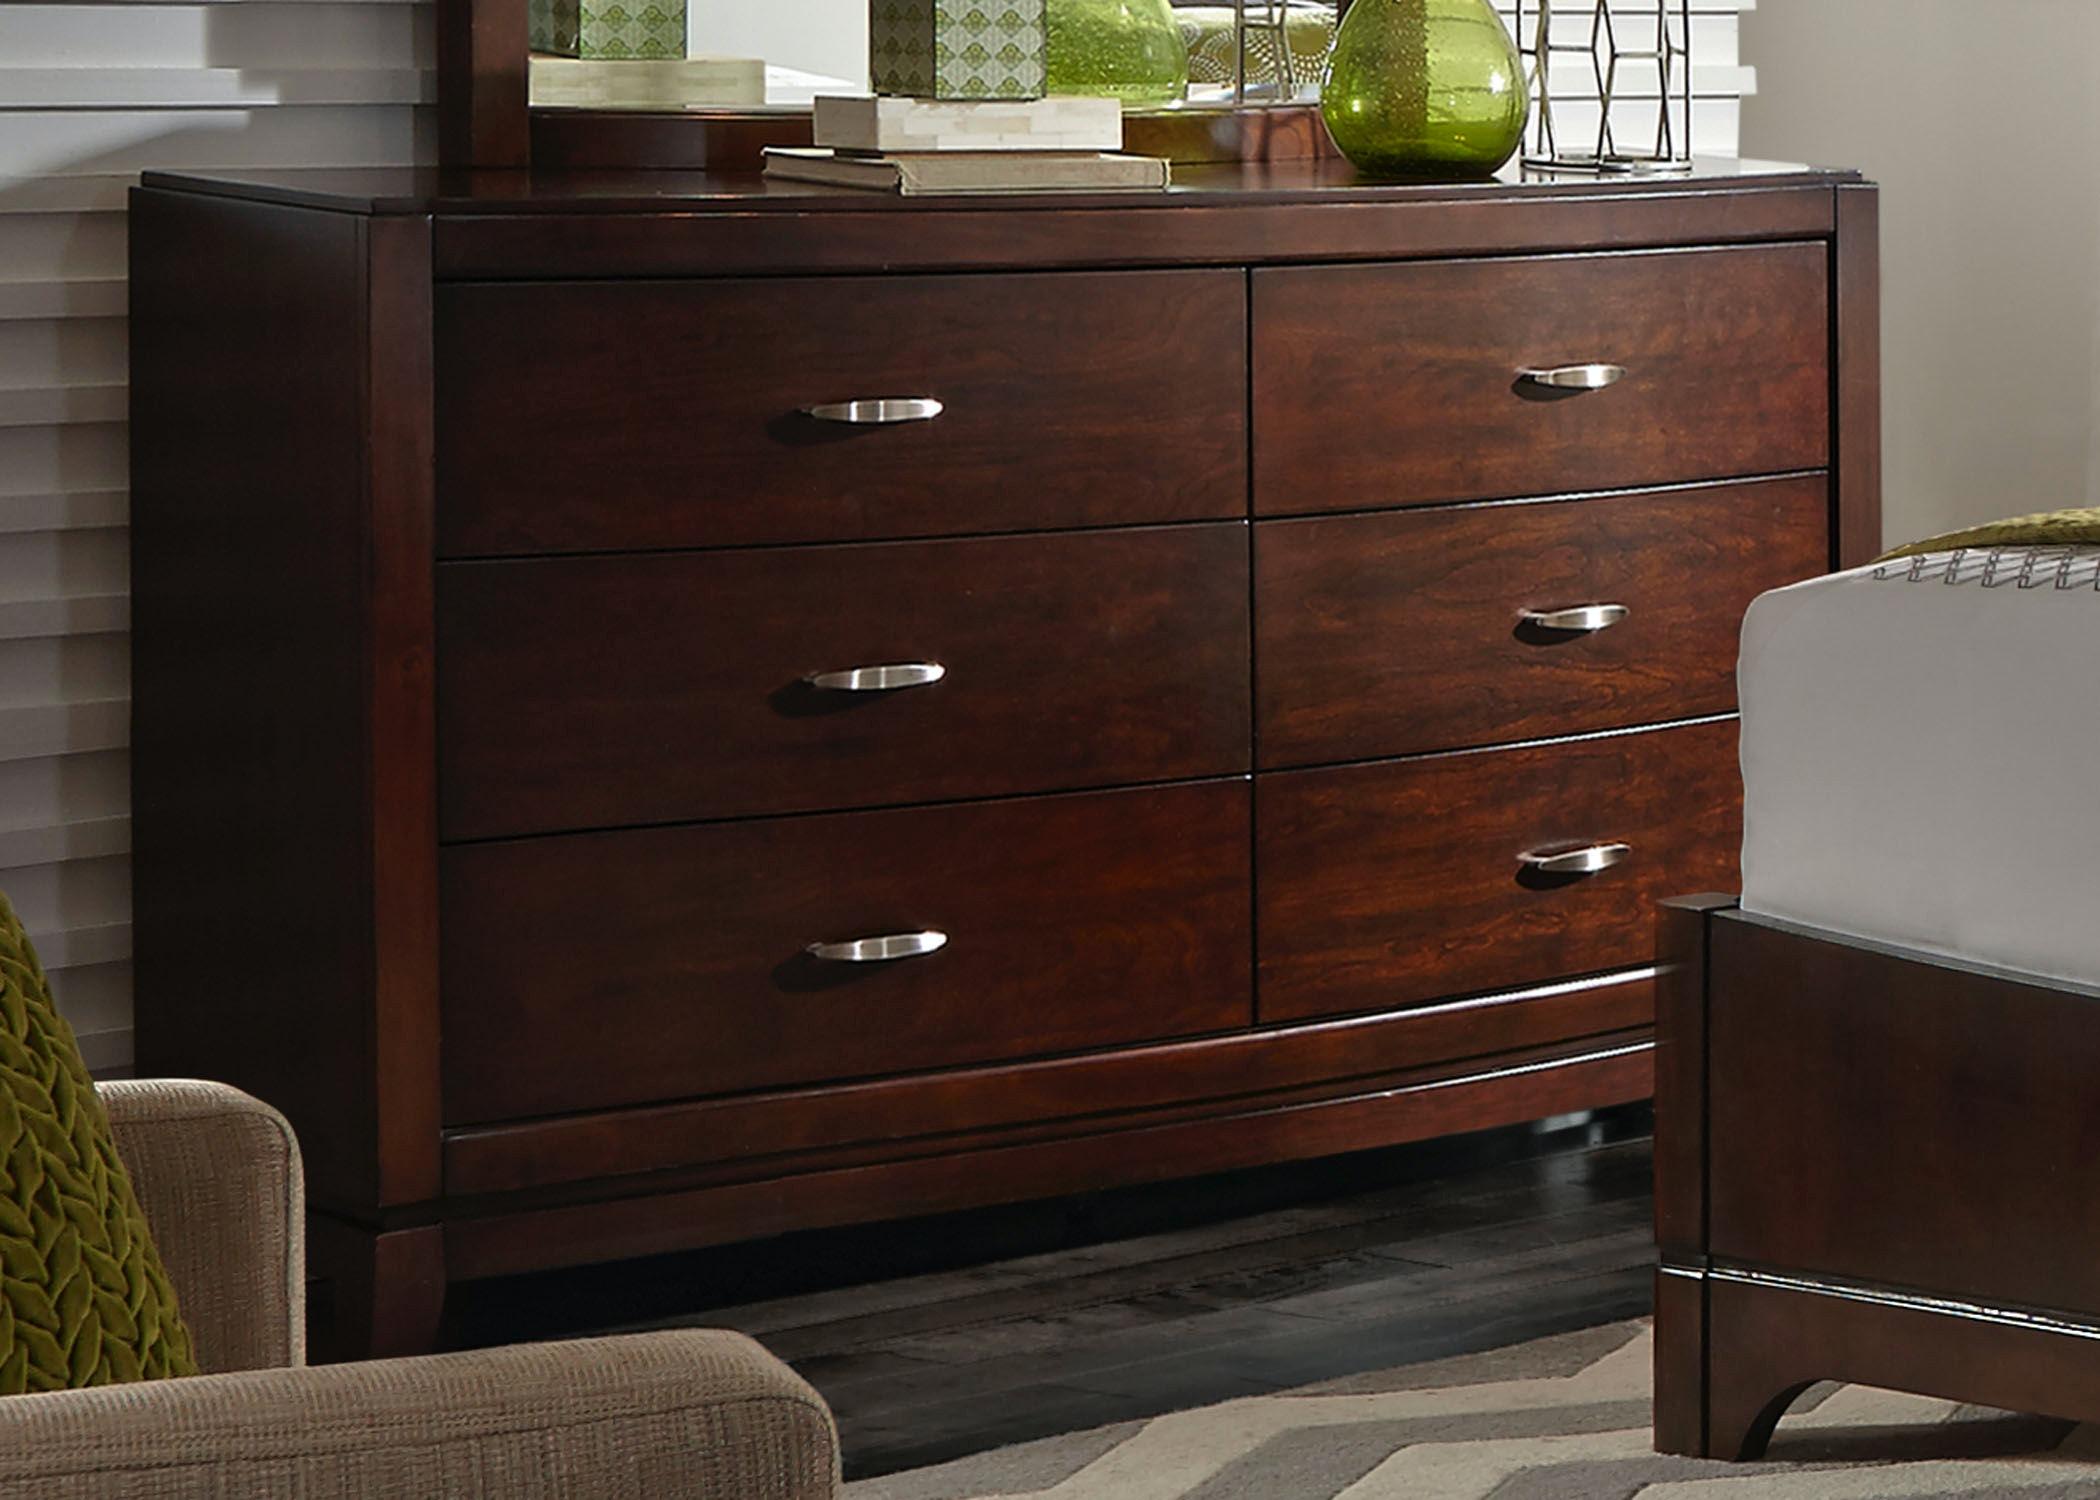 Liberty Furniture Bedroom Dresser & Mirror 505 BR DM